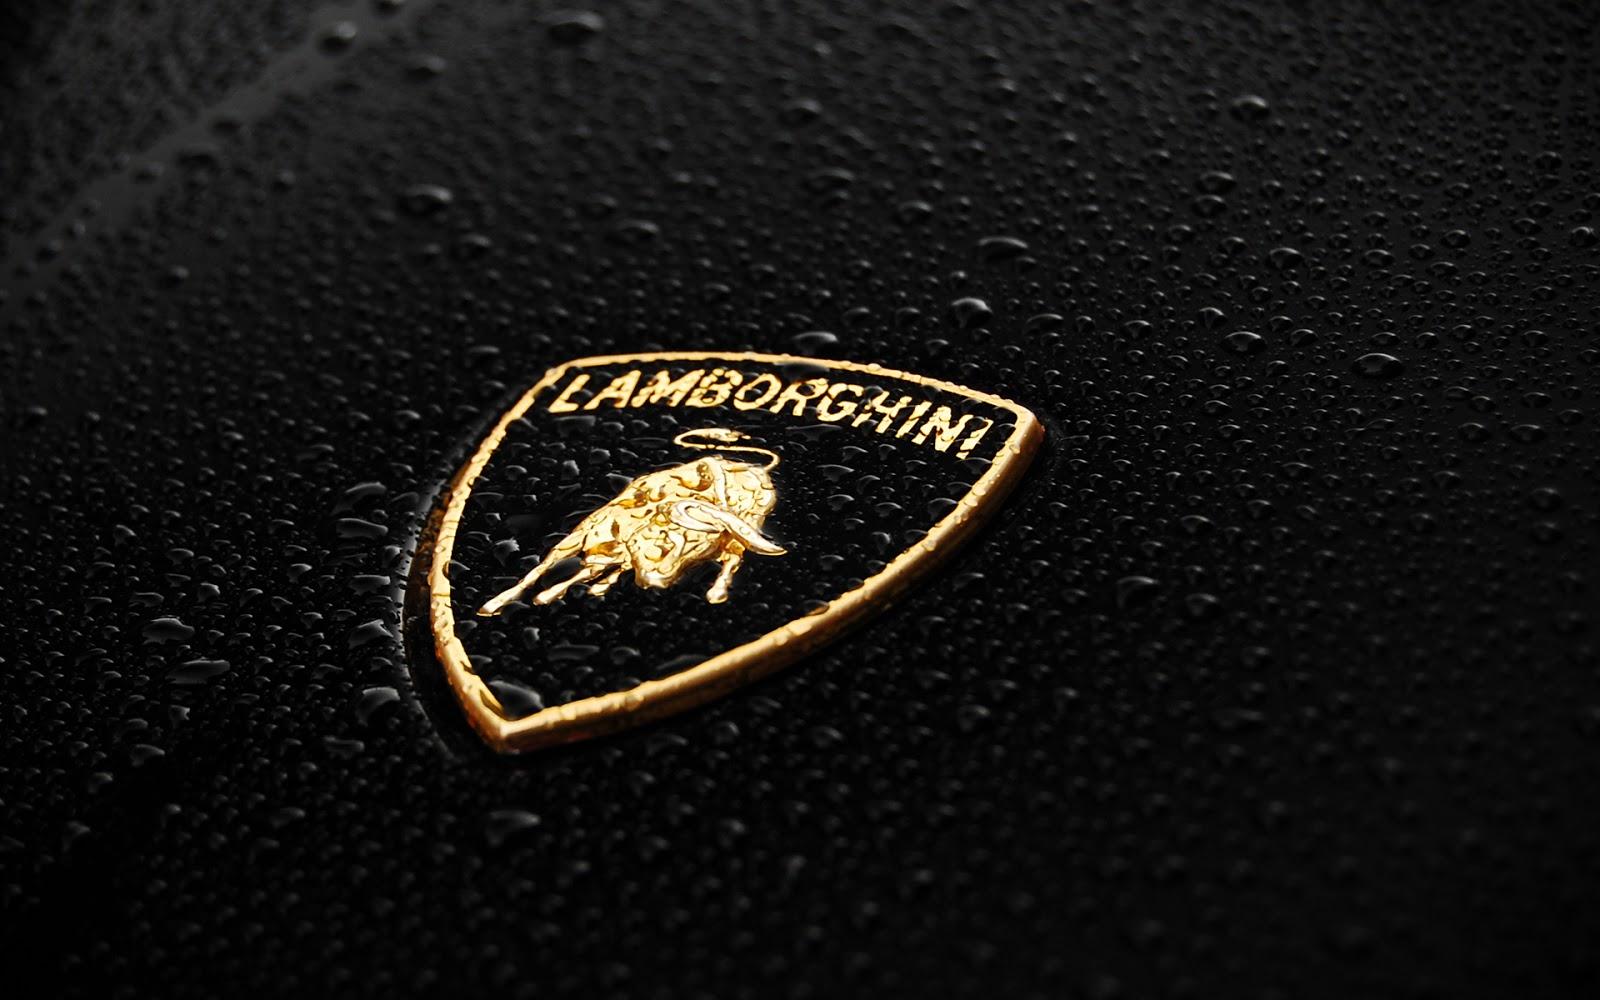 lamborghini logo wallpaper hd pics